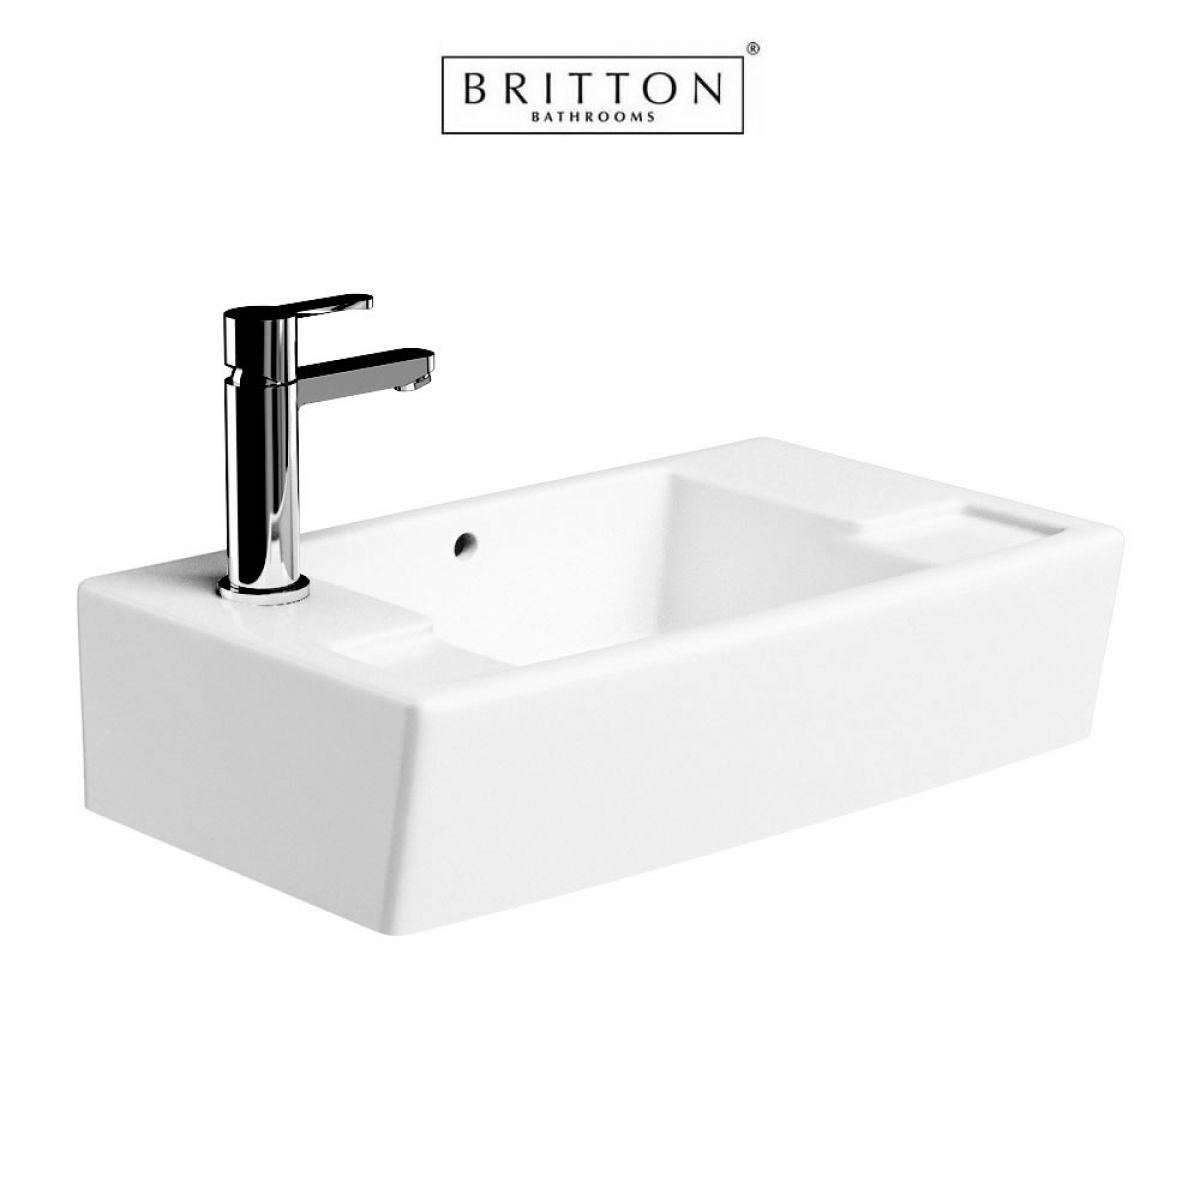 Home Bathroom Basins Wash Basins